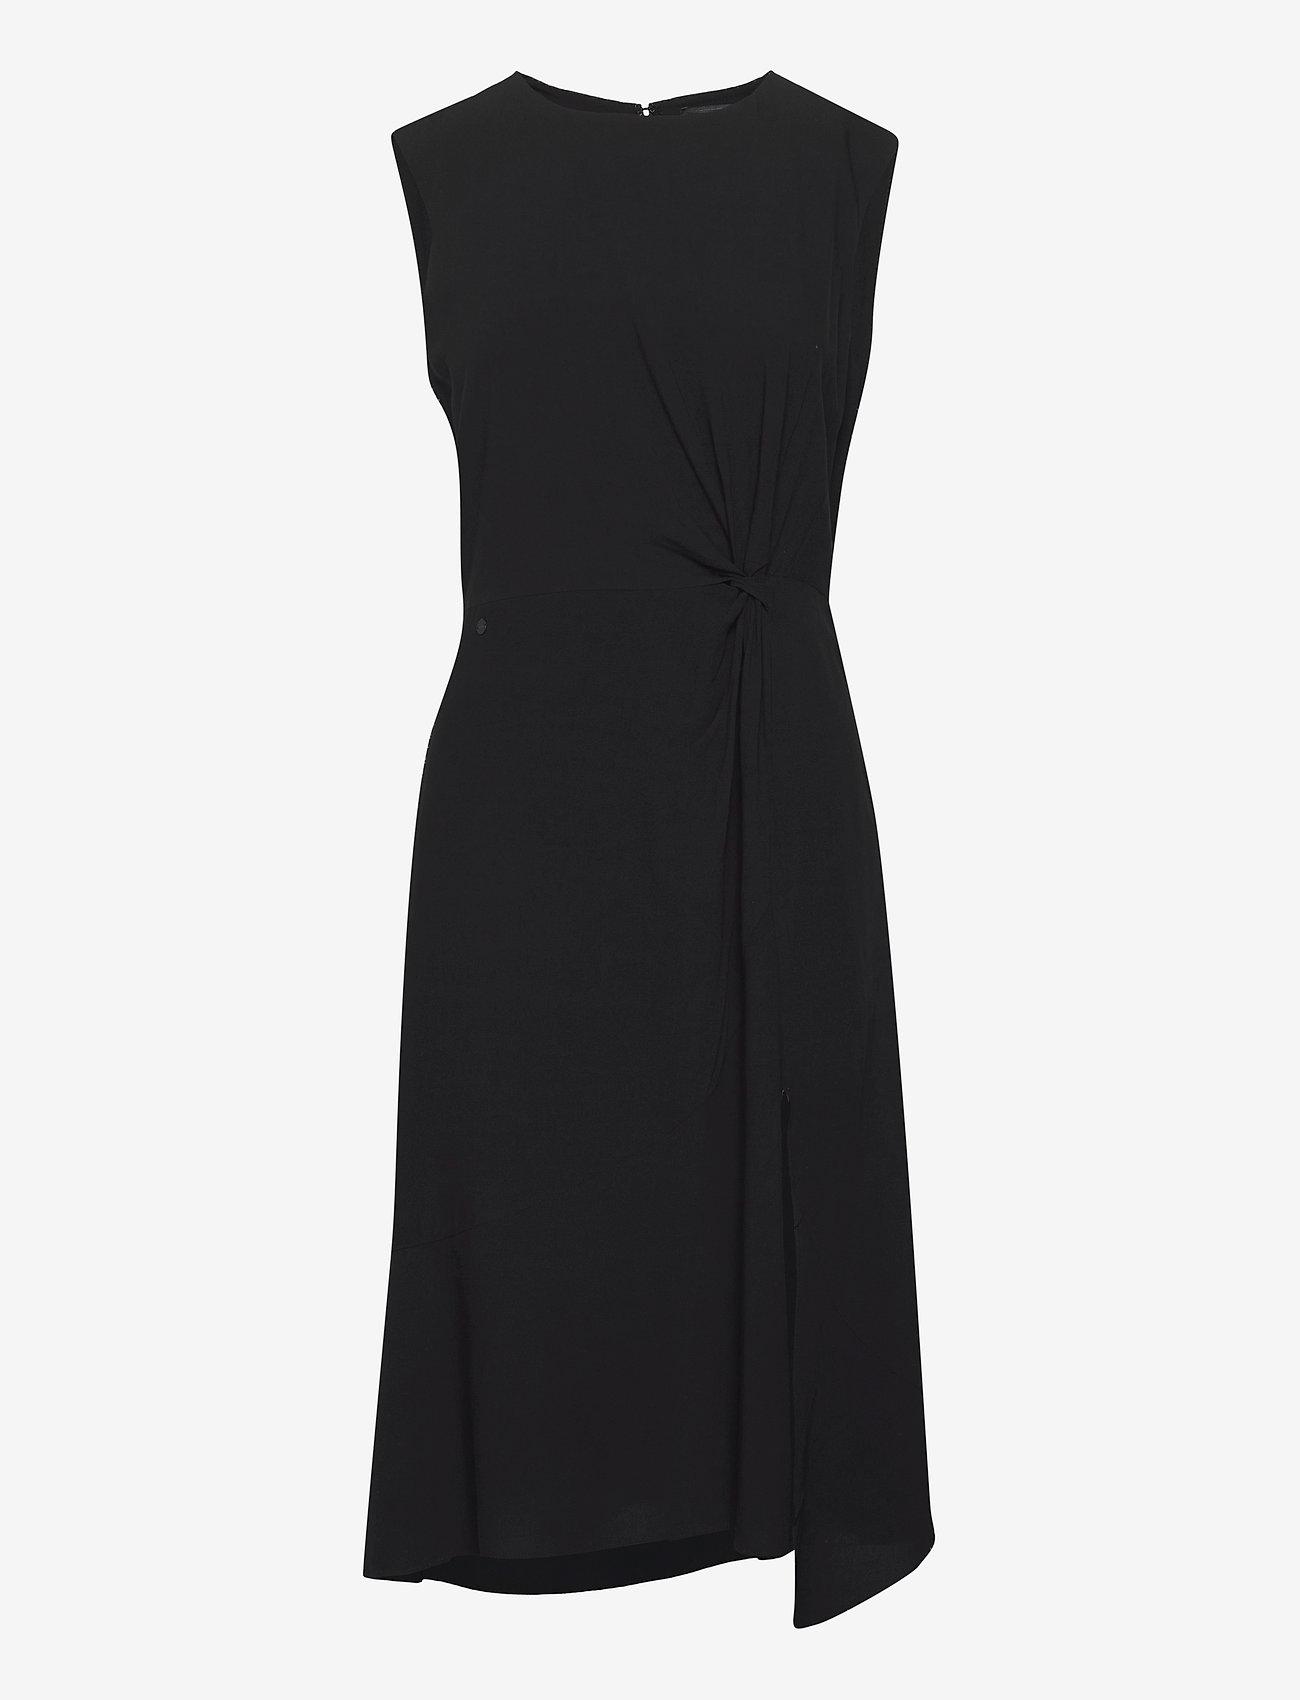 Superdry - ECOVERO TWIST DRESS - summer dresses - black - 0